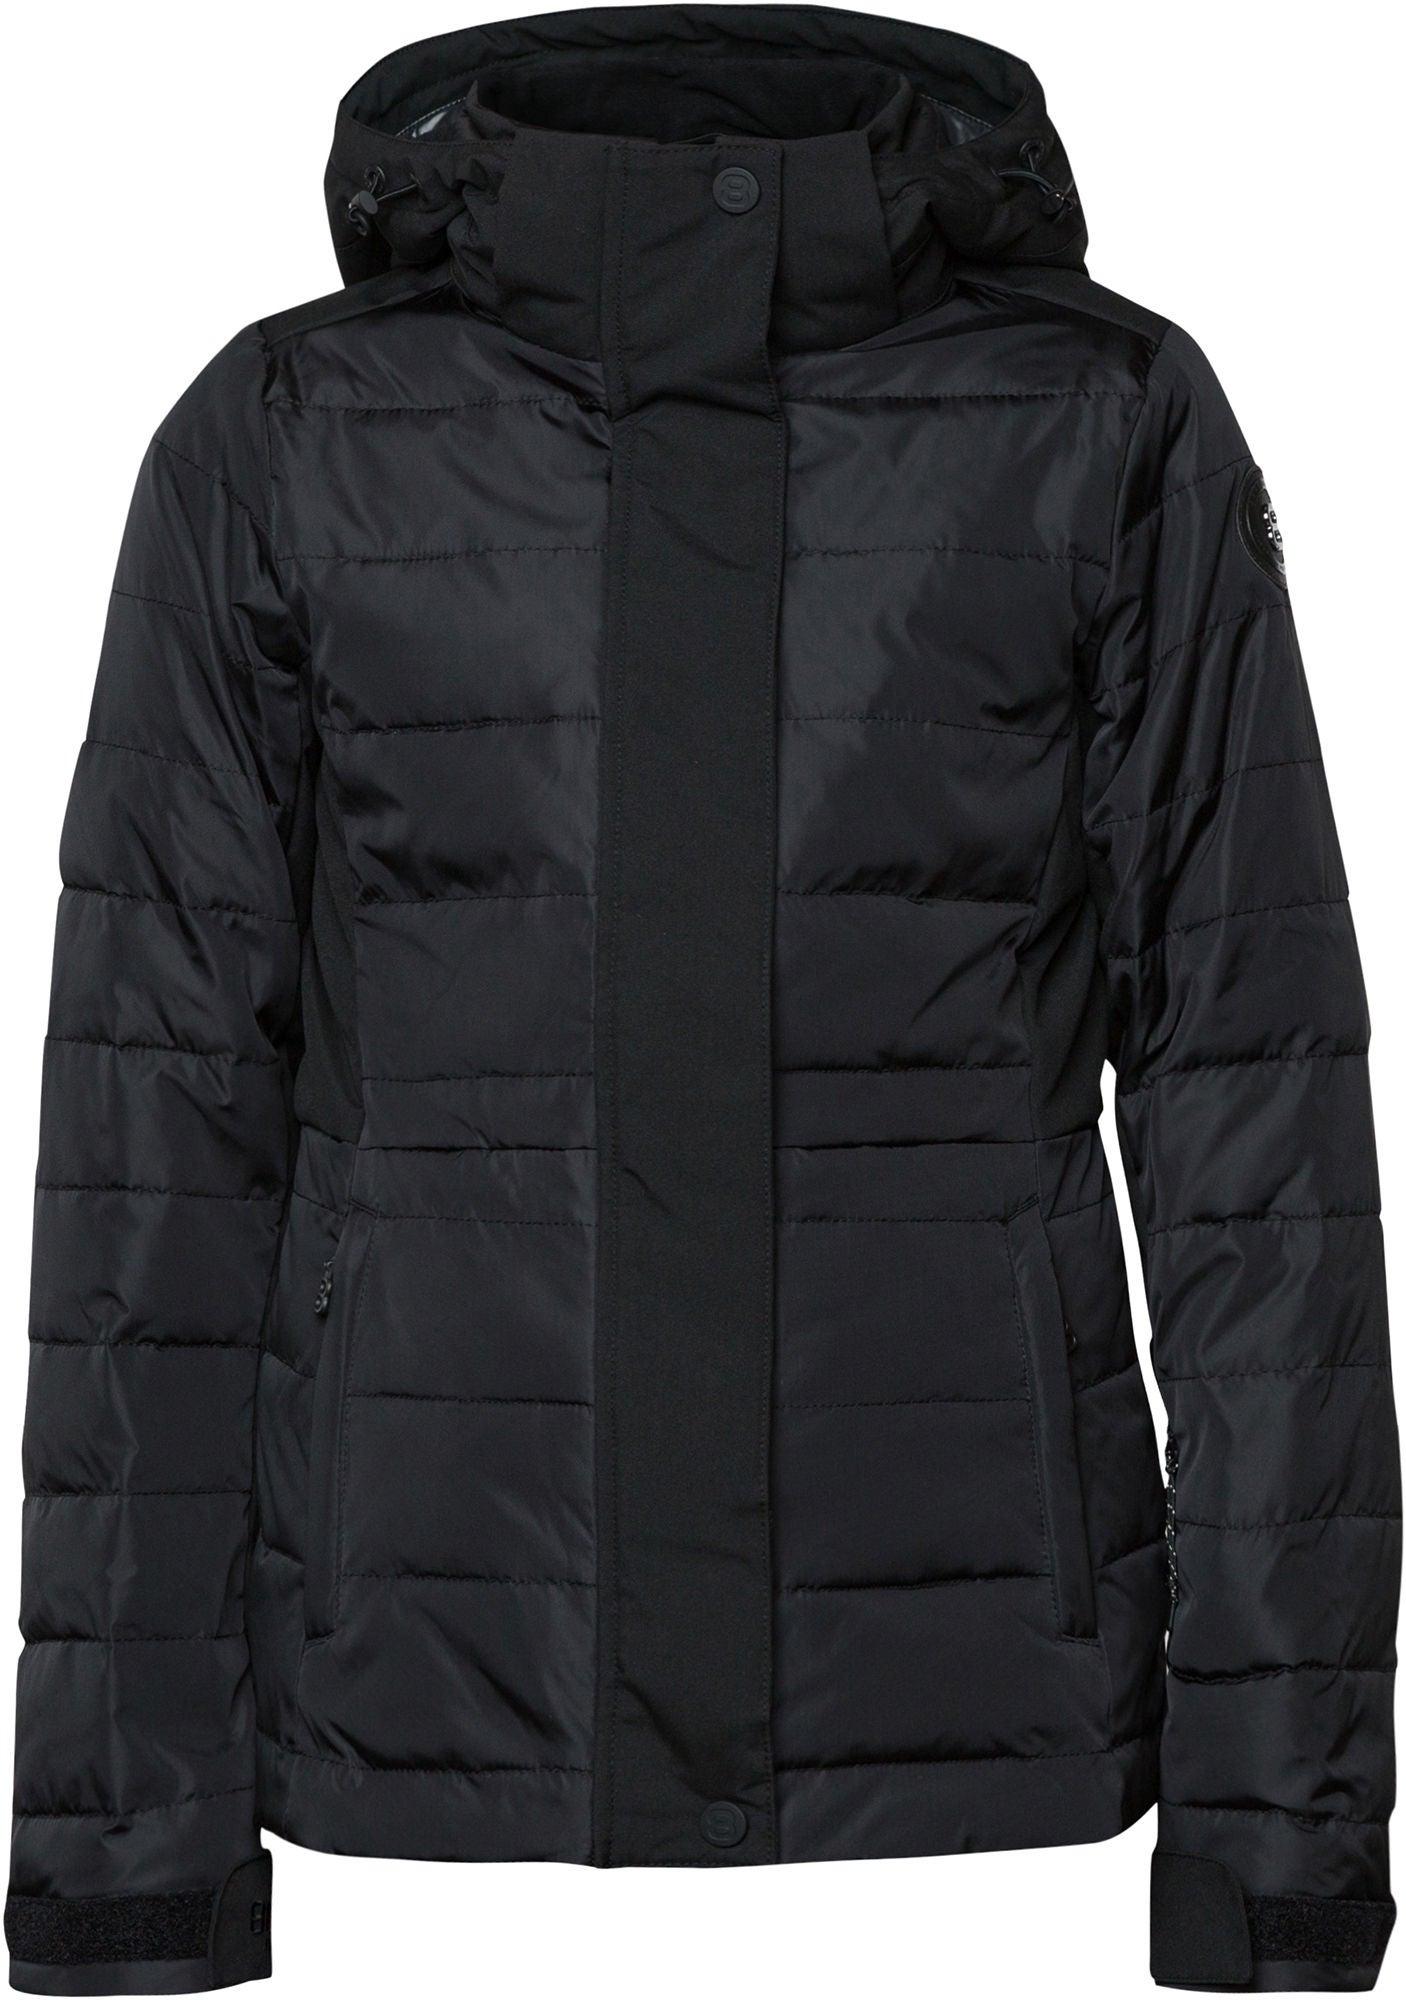 8848 Altitude Mini Jacka, Black 120